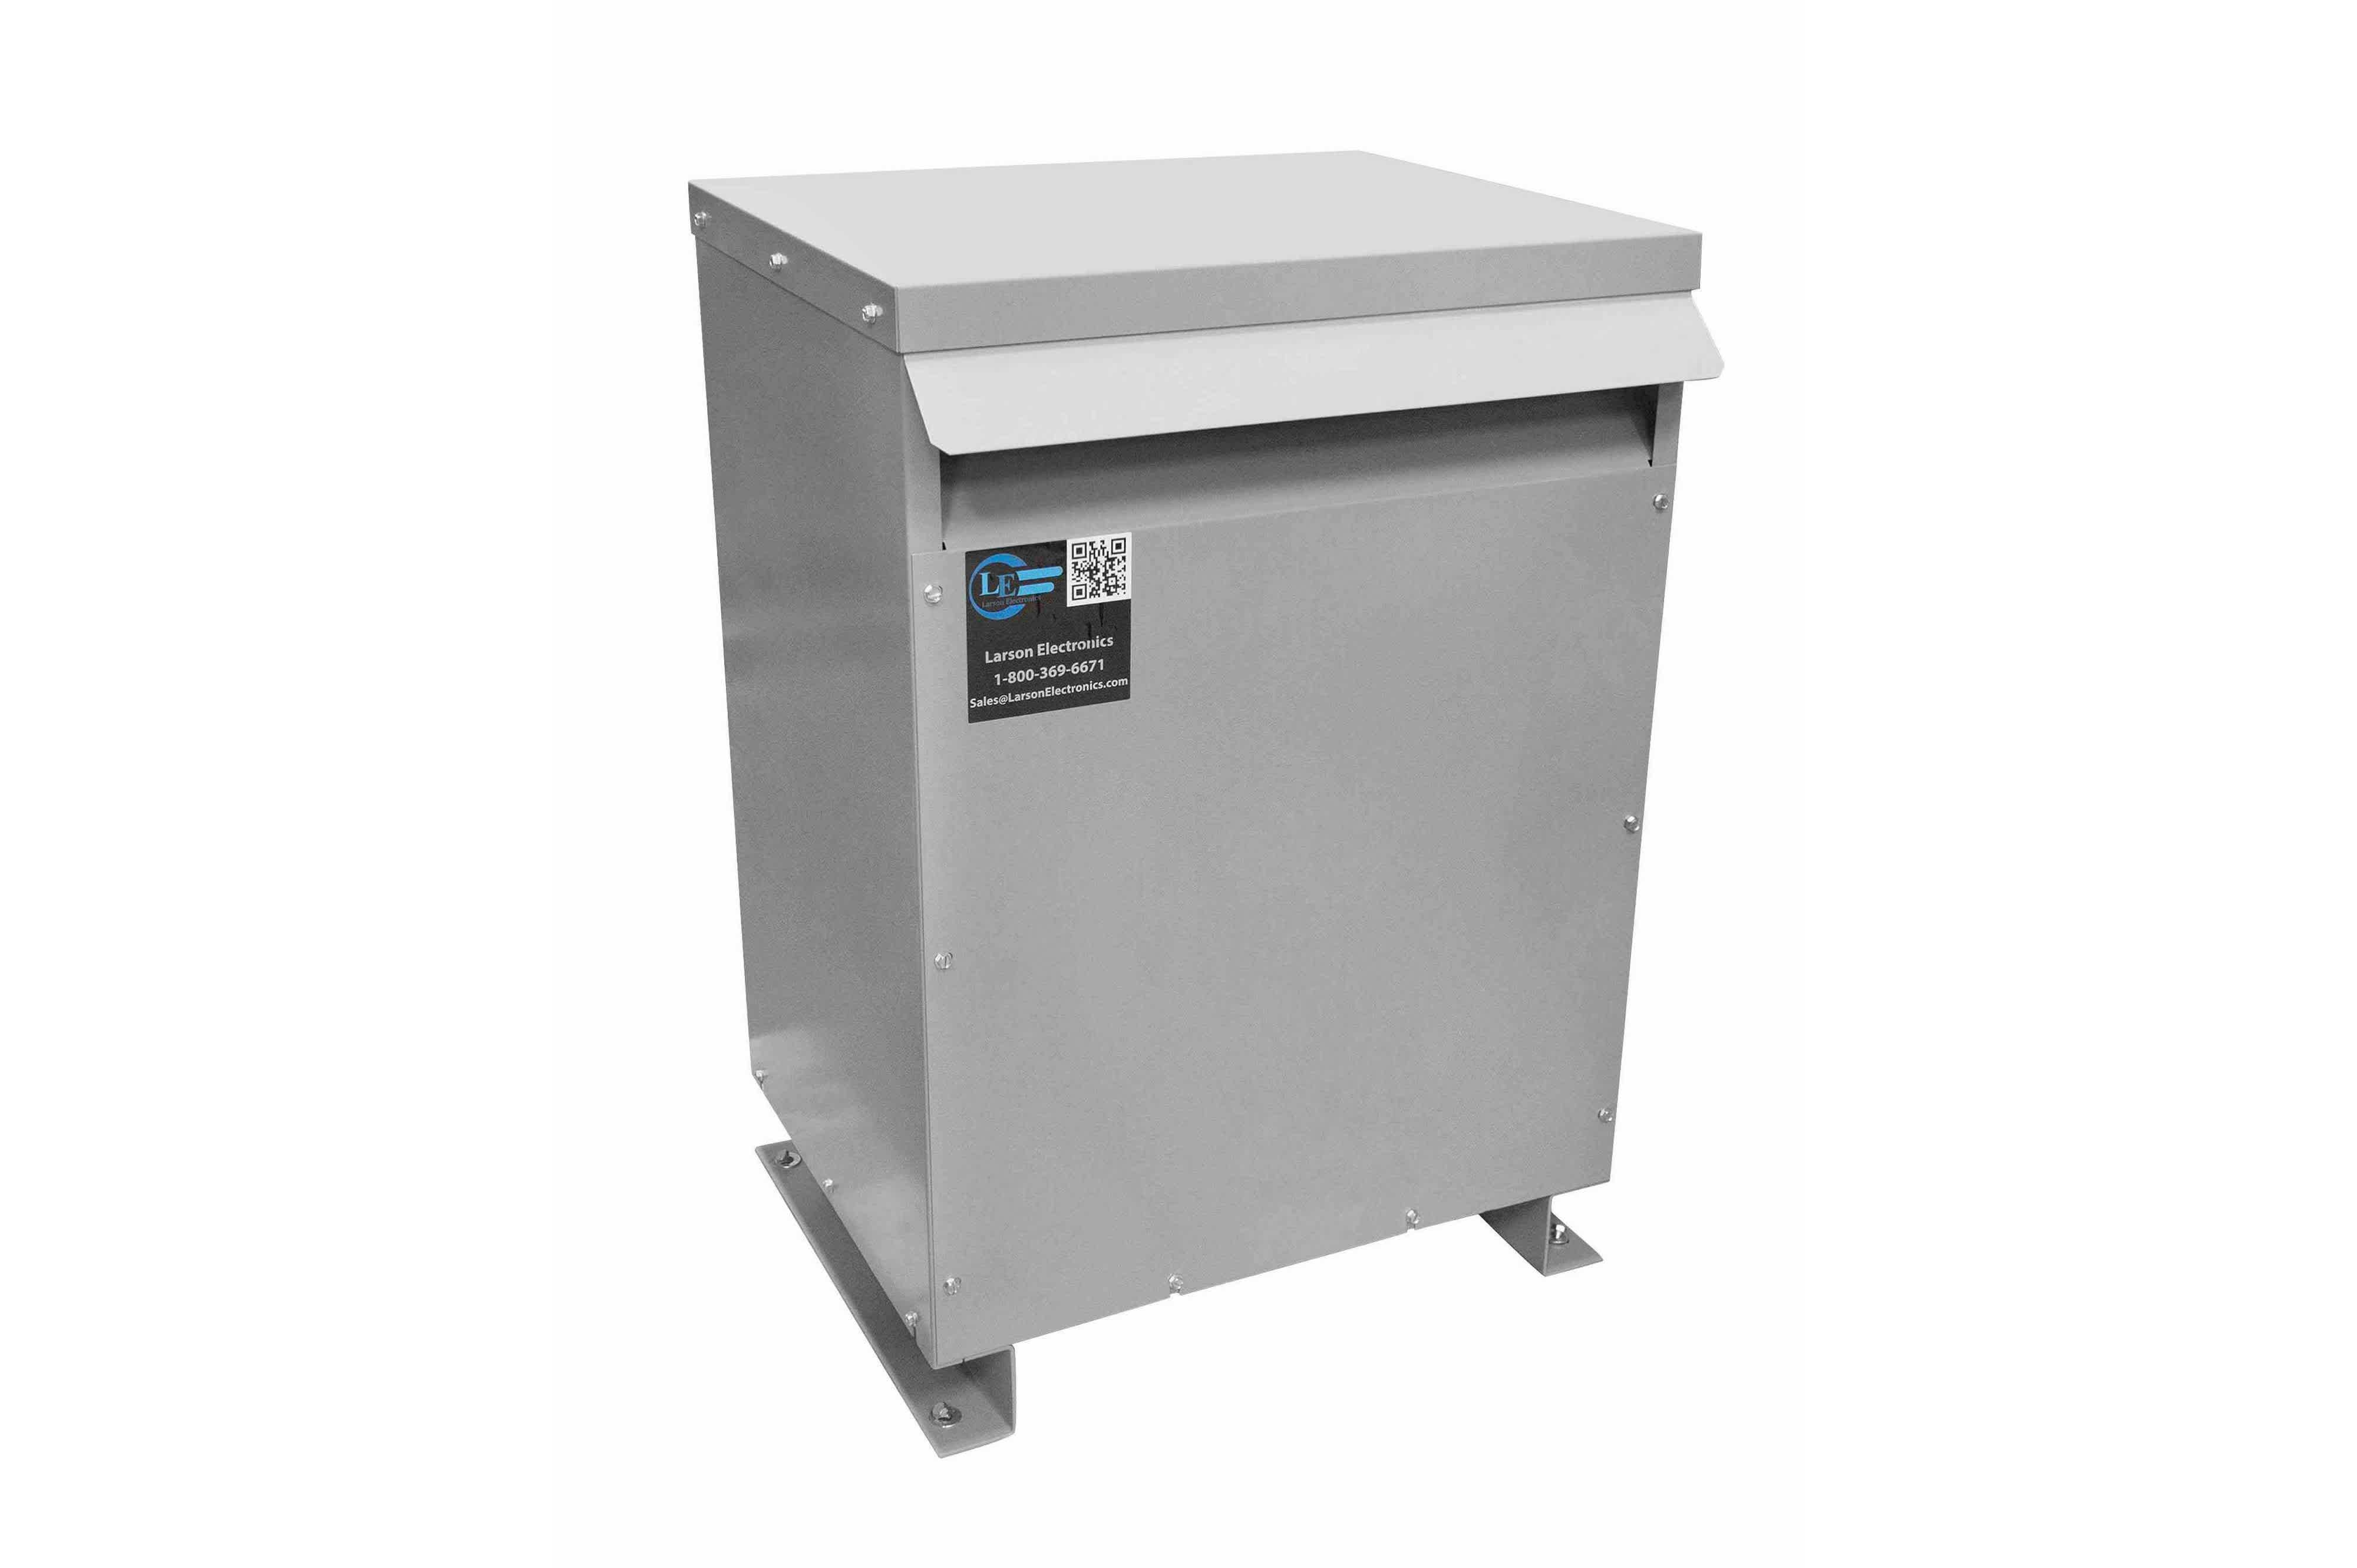 38 kVA 3PH Isolation Transformer, 575V Wye Primary, 380Y/220 Wye-N Secondary, N3R, Ventilated, 60 Hz